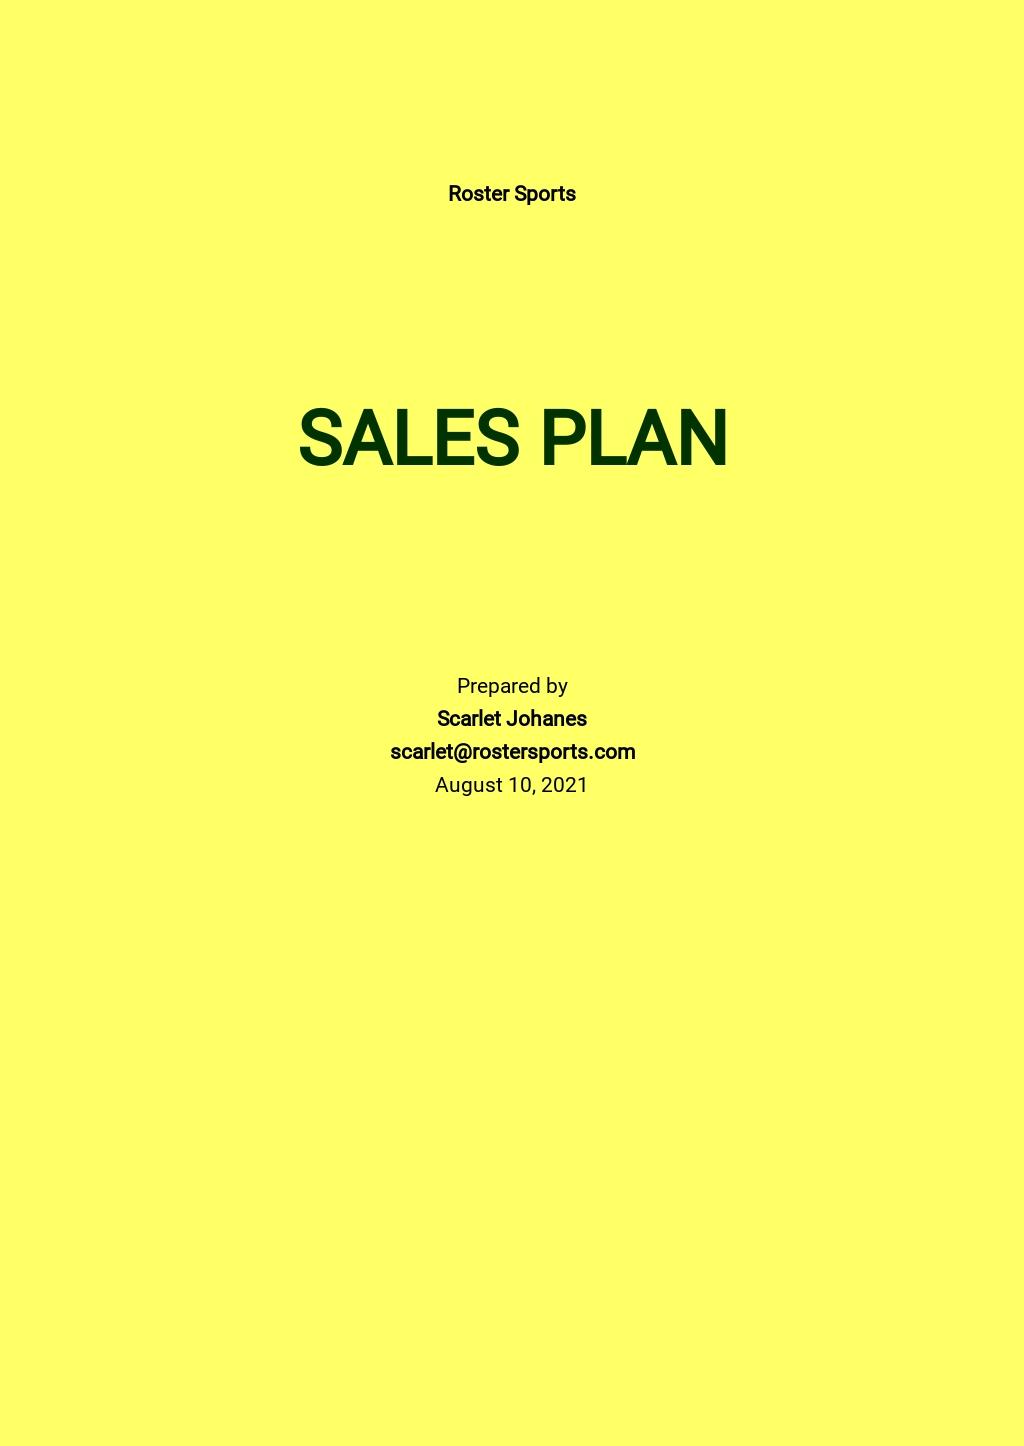 Sport Equipment Sales Plan Template